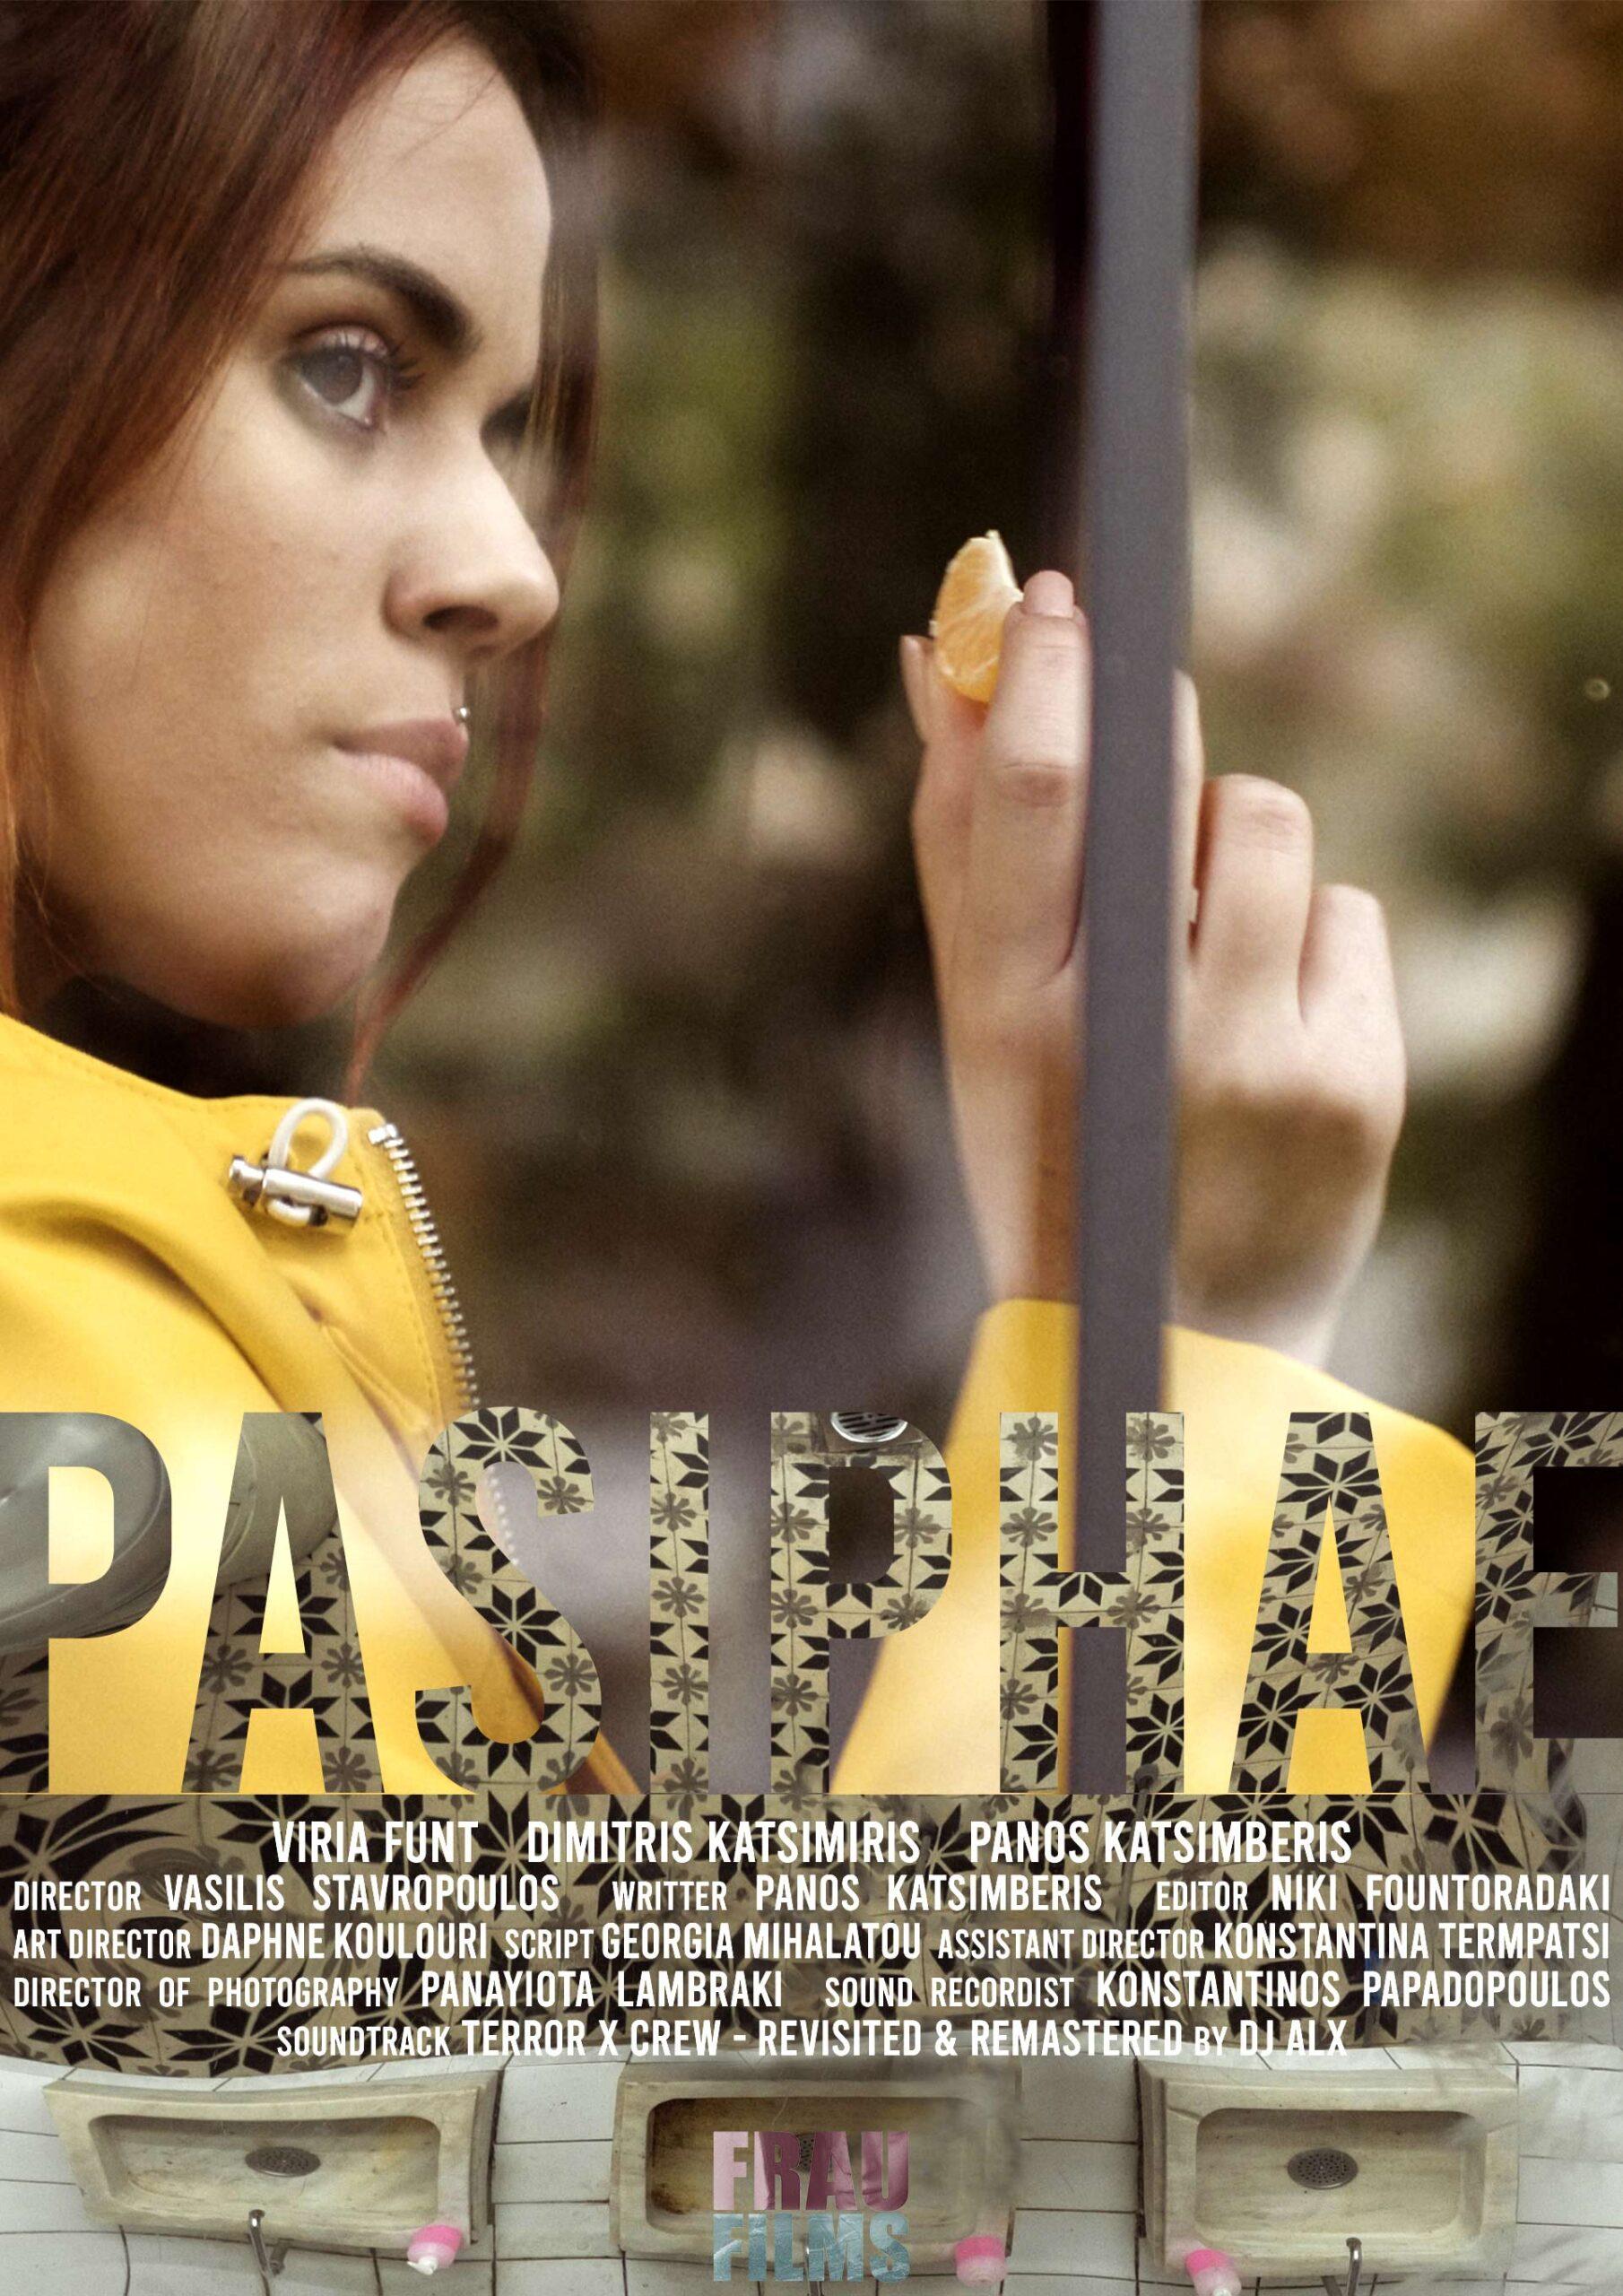 PASIPHAE (2020) 8'